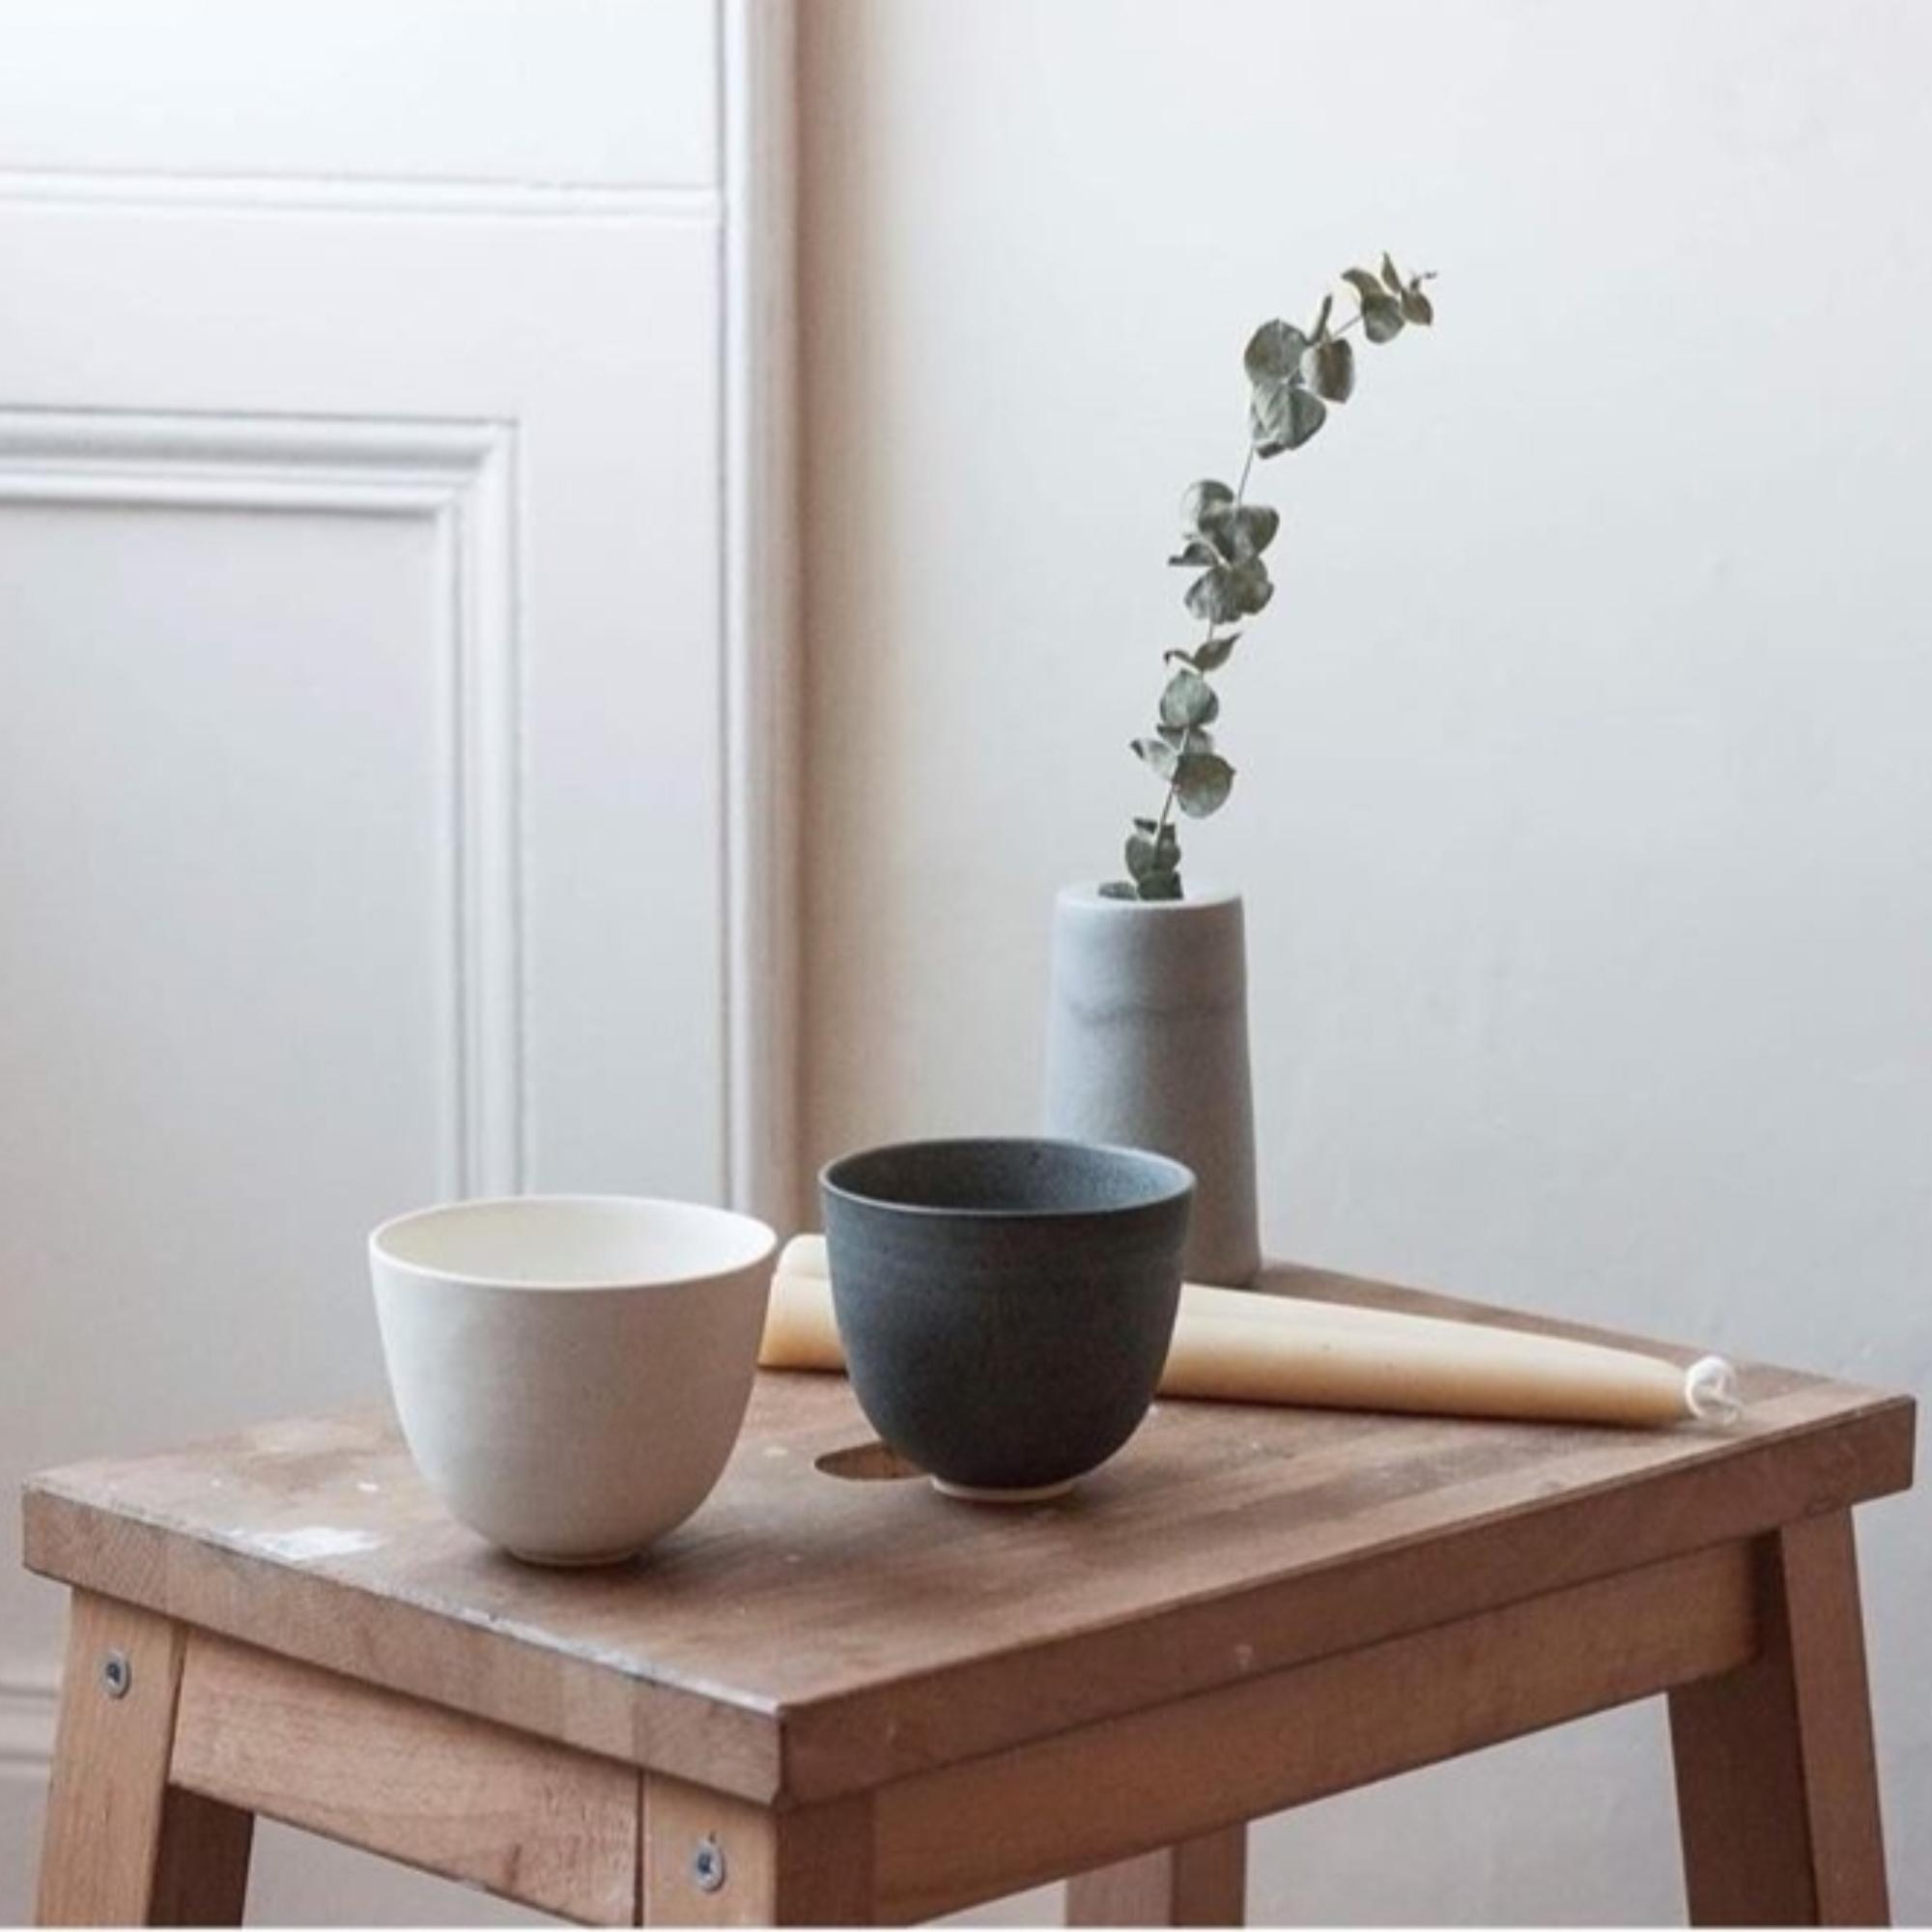 Cups and Beakers by Borja Moronta